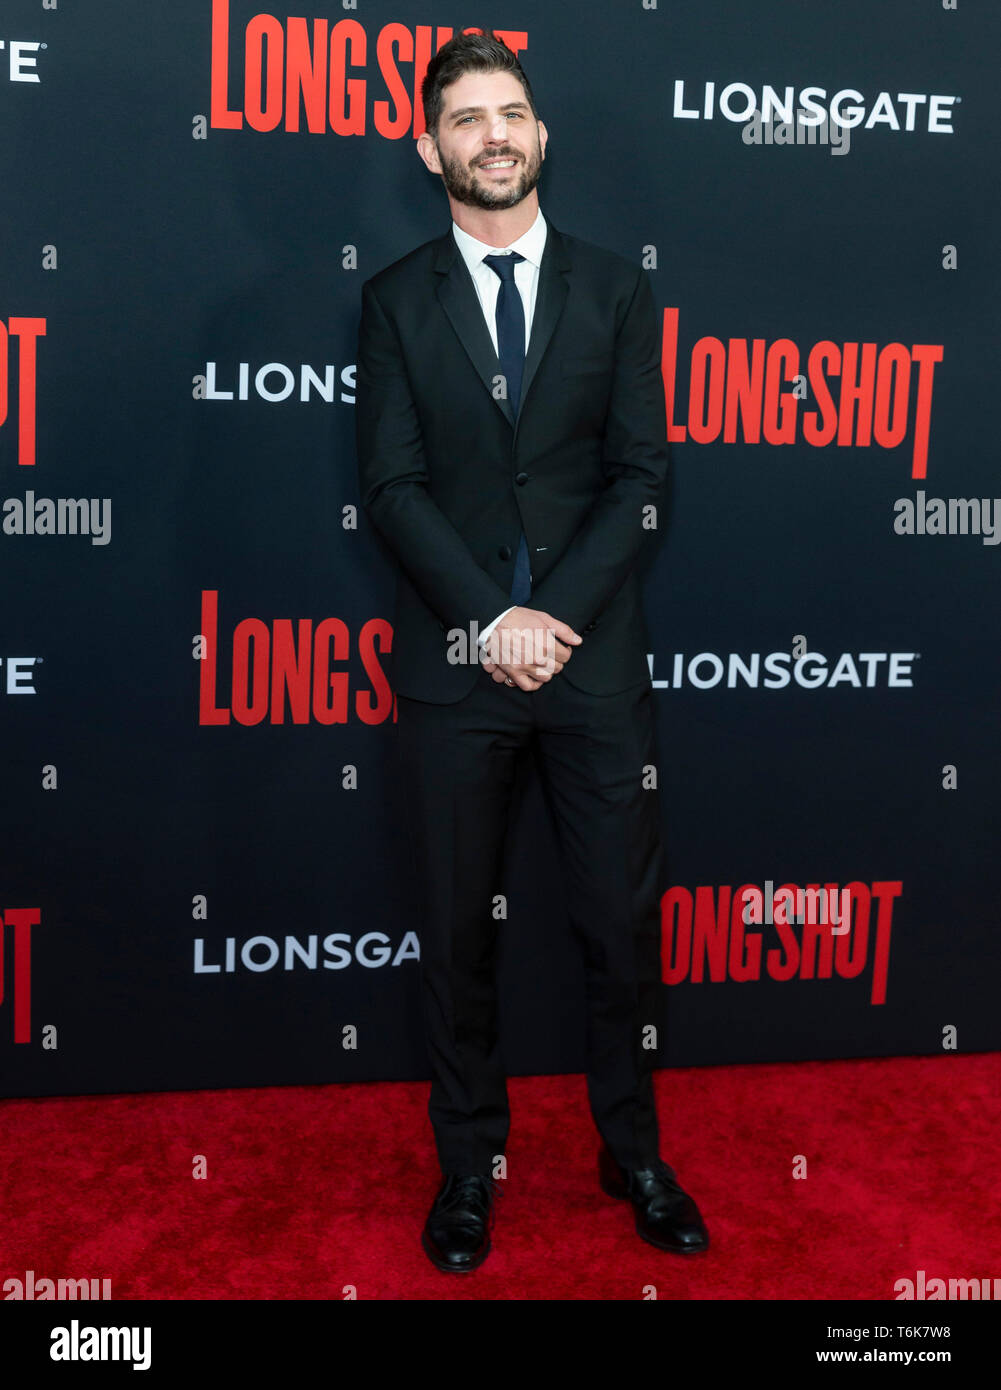 New York, NY - 30. April: Jonathan Levine die Premiere von 'Long Shot besucht' bei AMC Lincoln Square Theater Stockbild